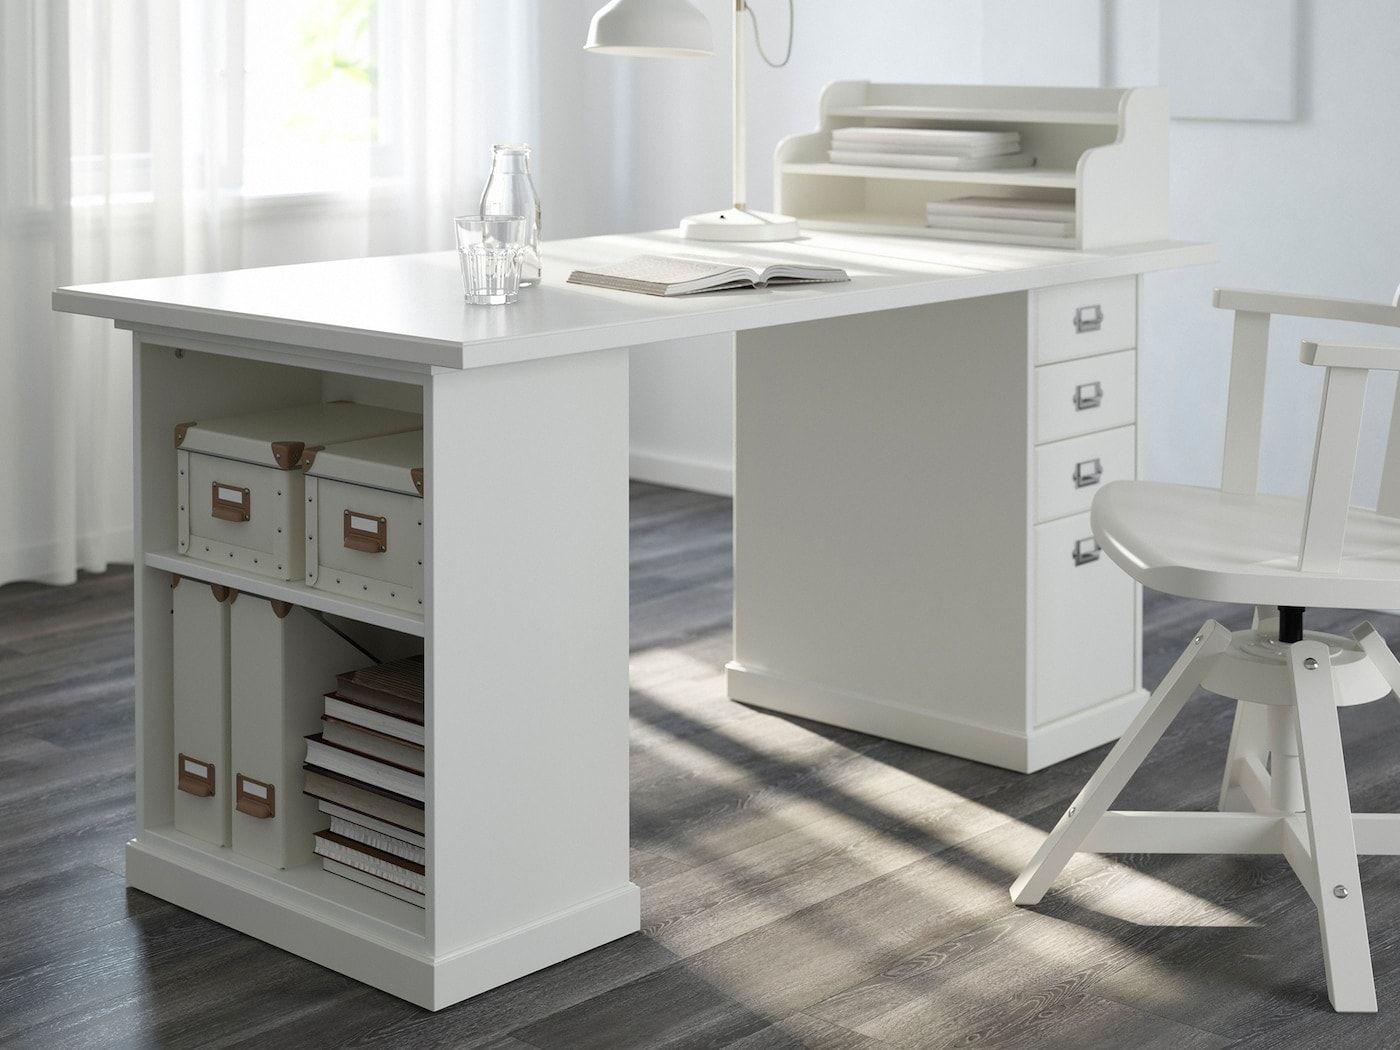 Build your own Desk Planner IKEA Desk planners, Ikea